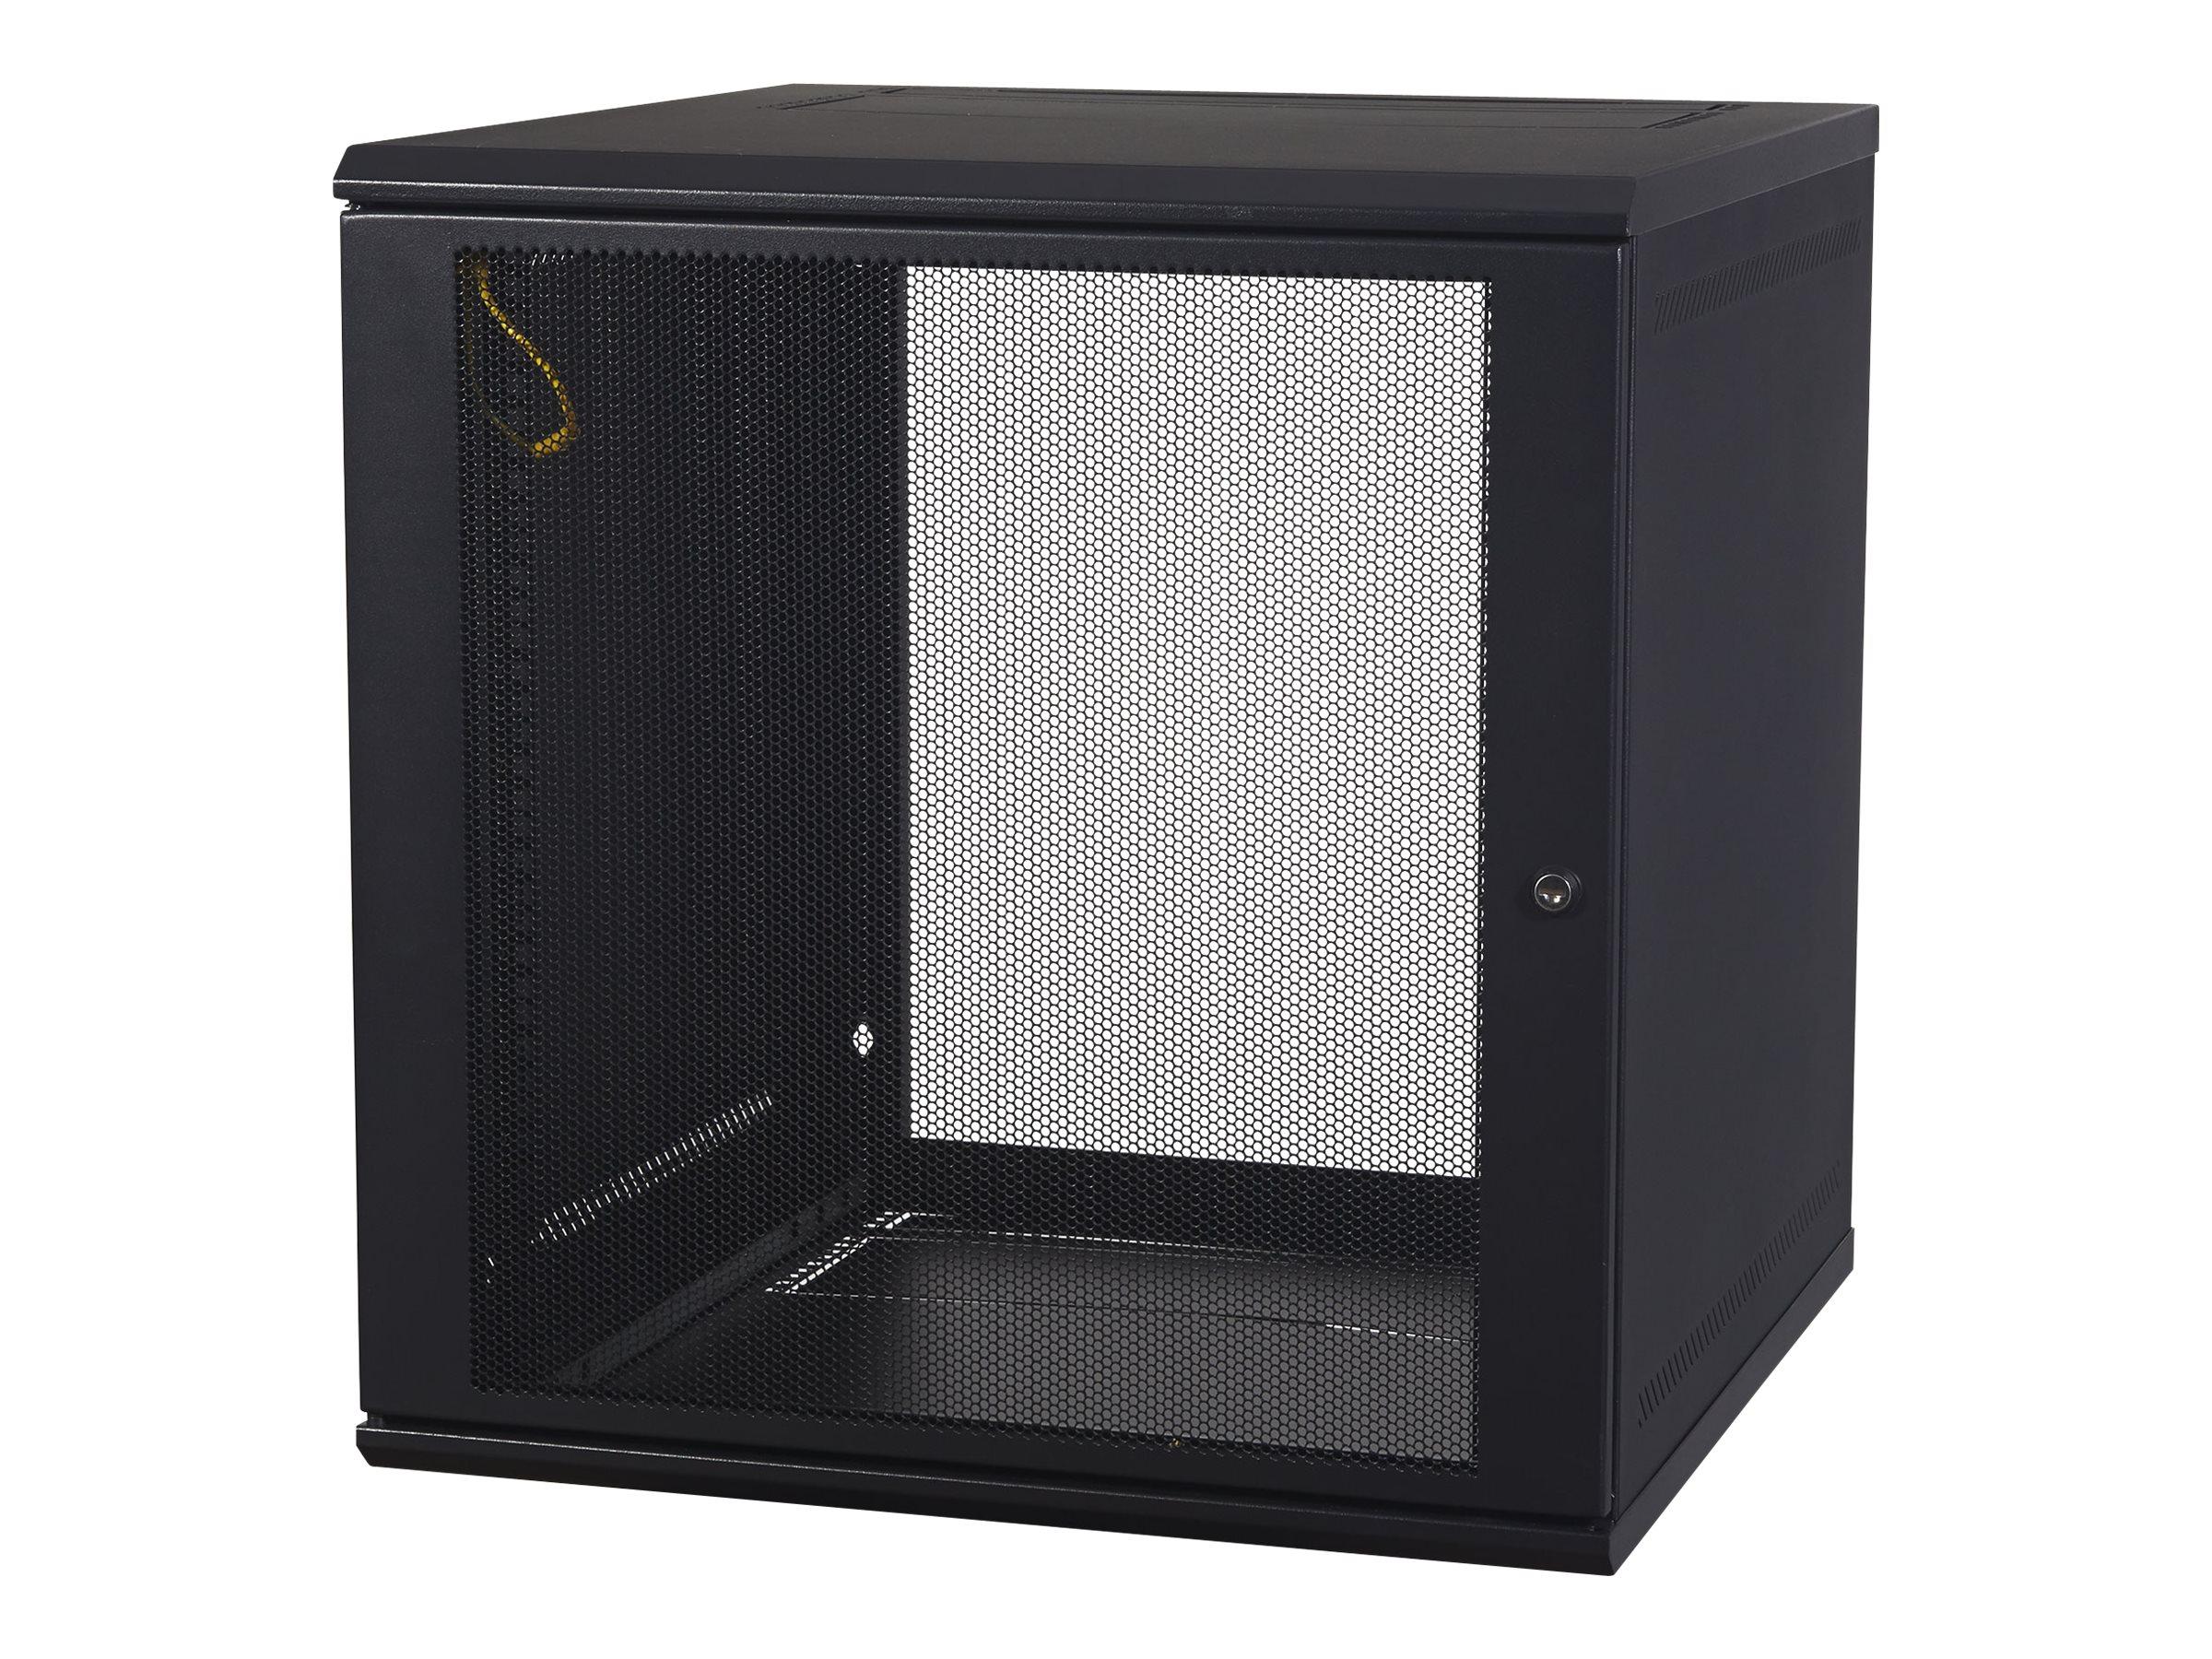 APC Netshelter WX 12U Wall Mount Cabinet, Instant Rebate - Save $35